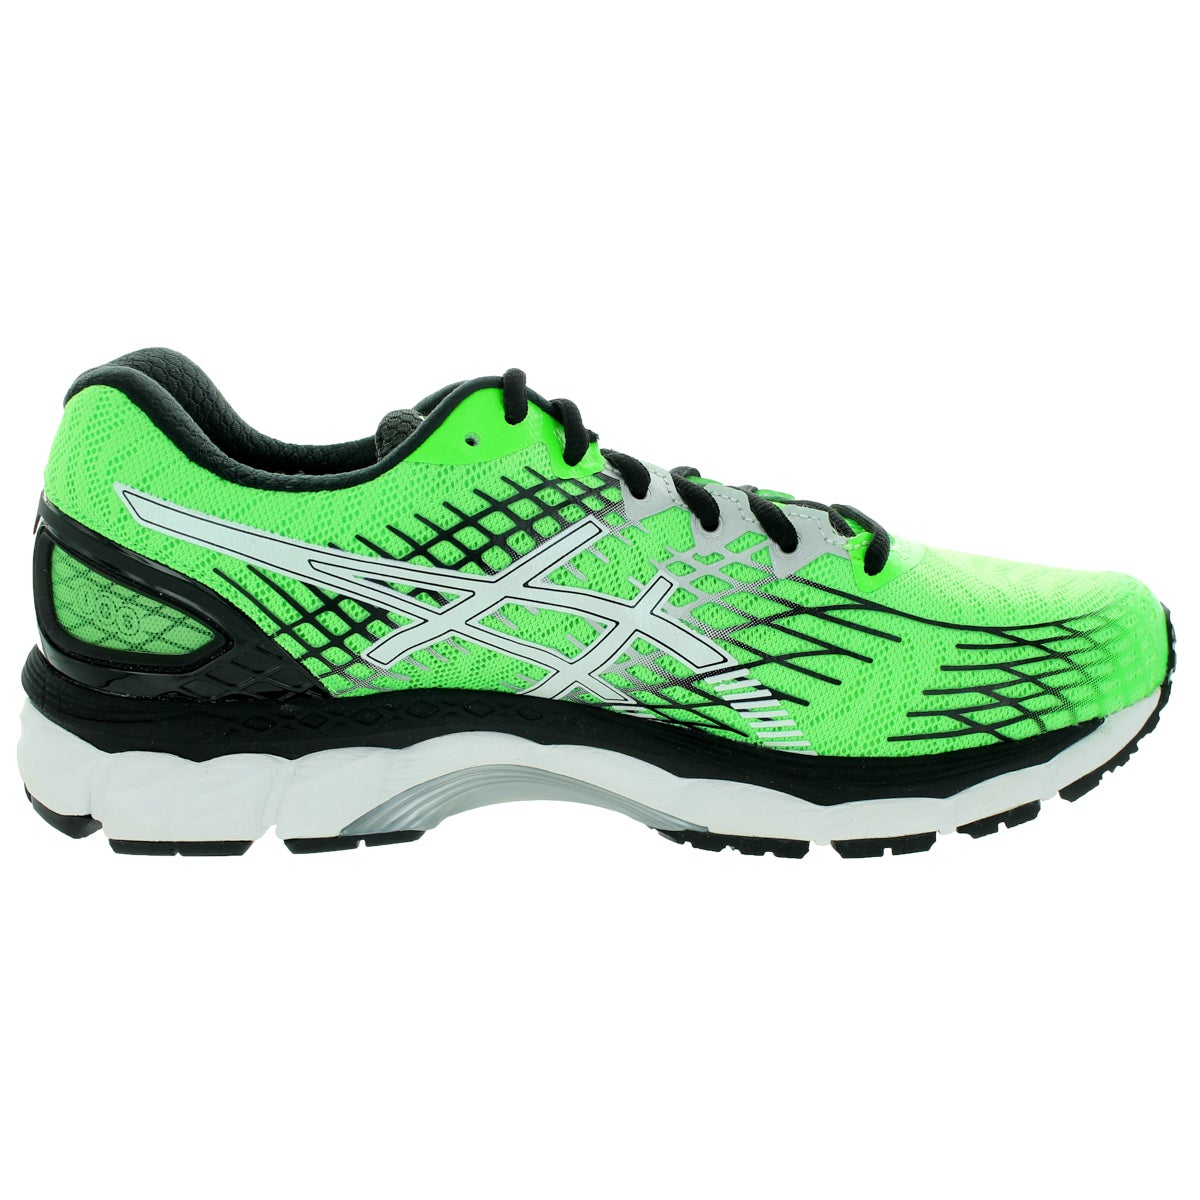 5483b456b5fc Shop Asics Men s Gel-Nimbus 17 Flash Green White Black Running Shoe - Free  Shipping Today - Overstock - 12321170